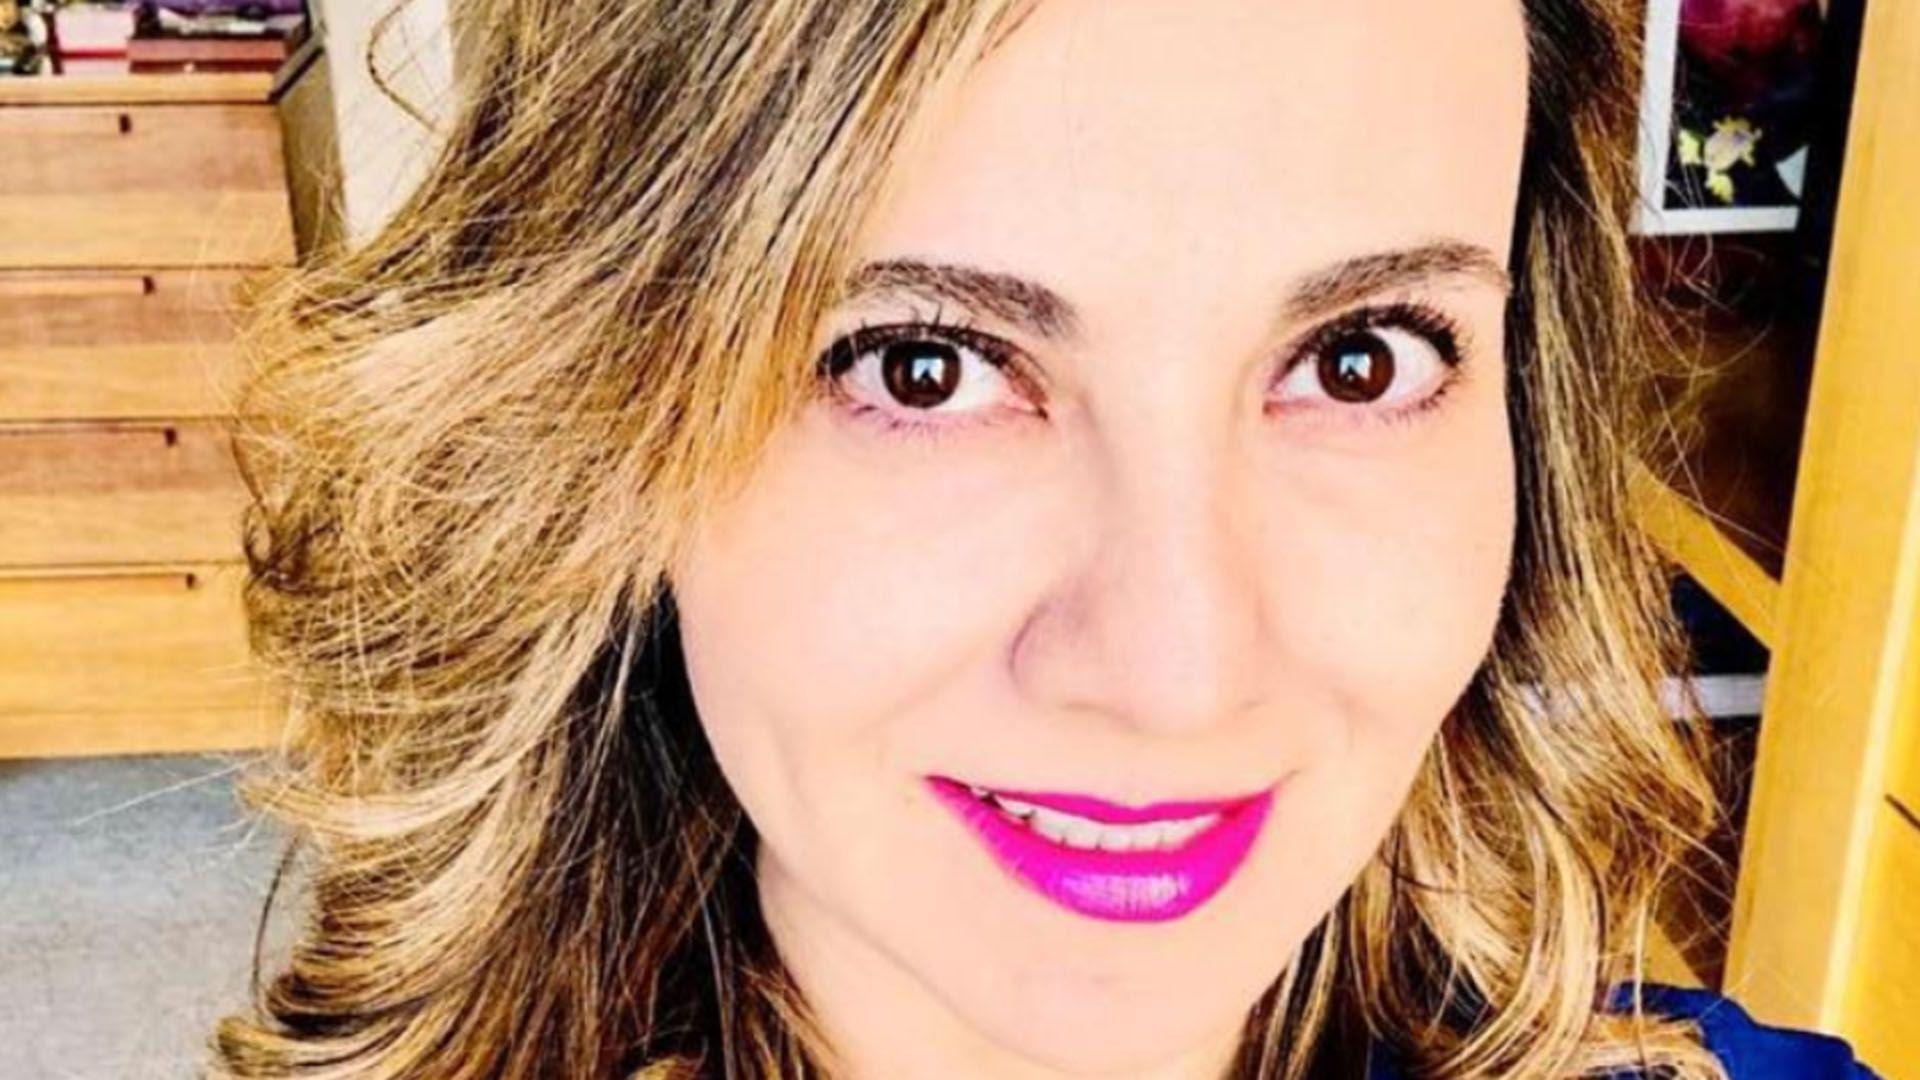 Abril Pérez Sagaón murió el pasado 25 de noviembre después de que fue atacada a balazos a bordo de un automóvil.